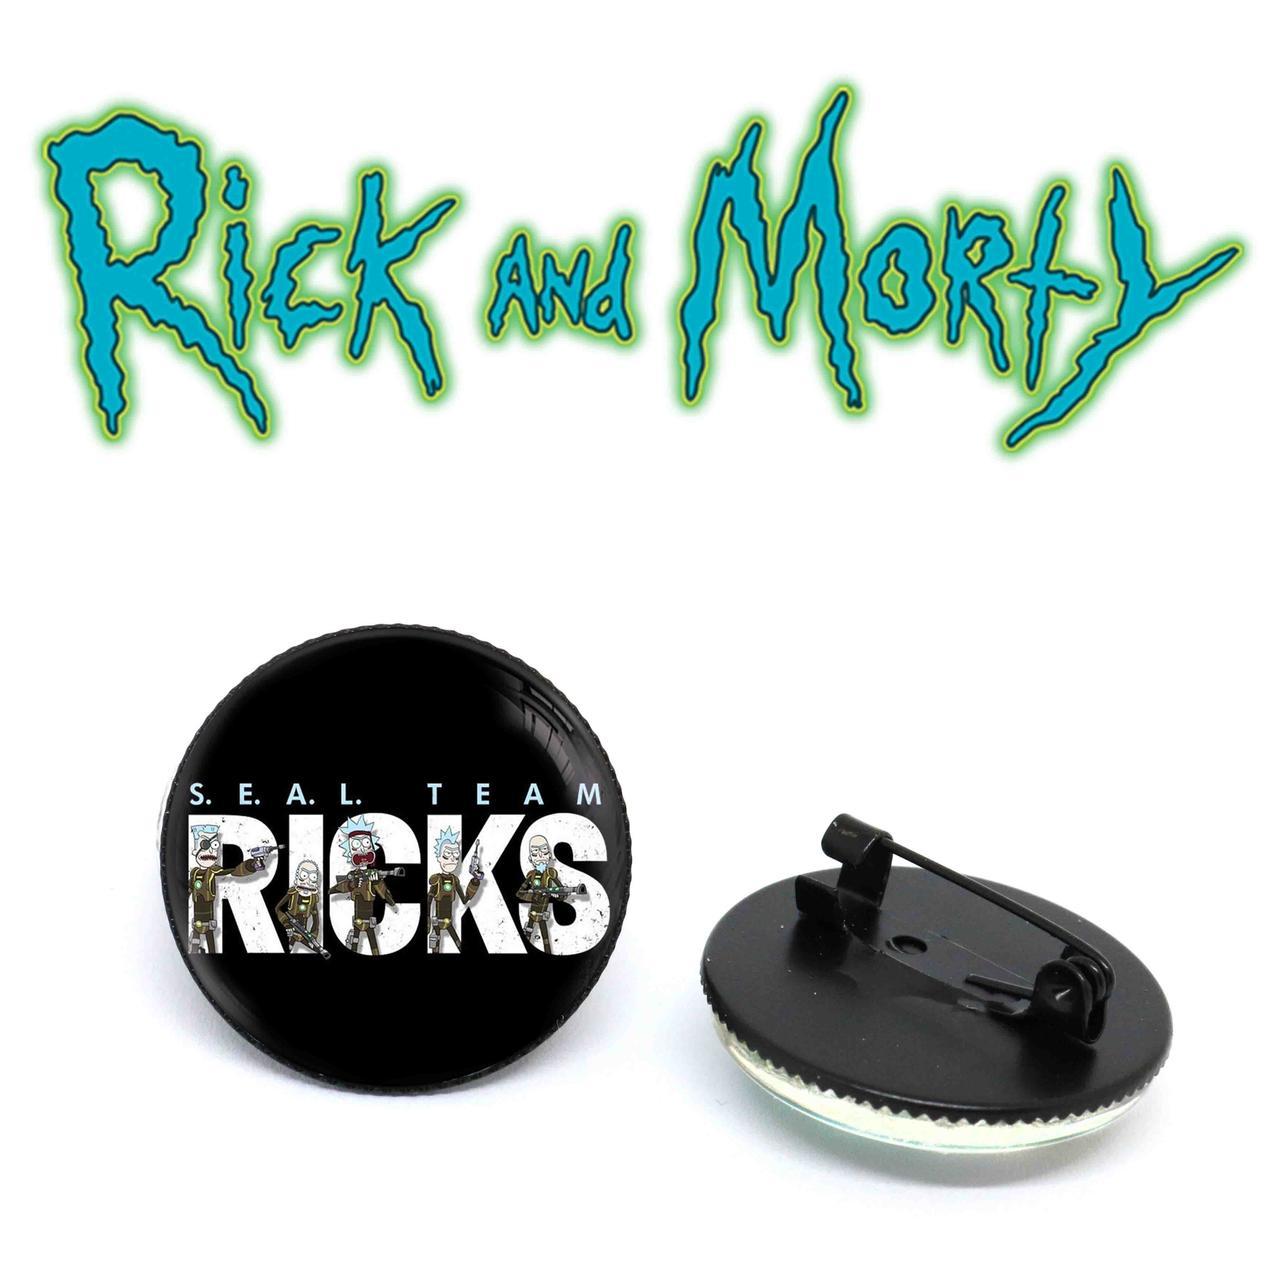 Значок S.E.A.L. team RICKS Рик и Морти / Rick and Morty